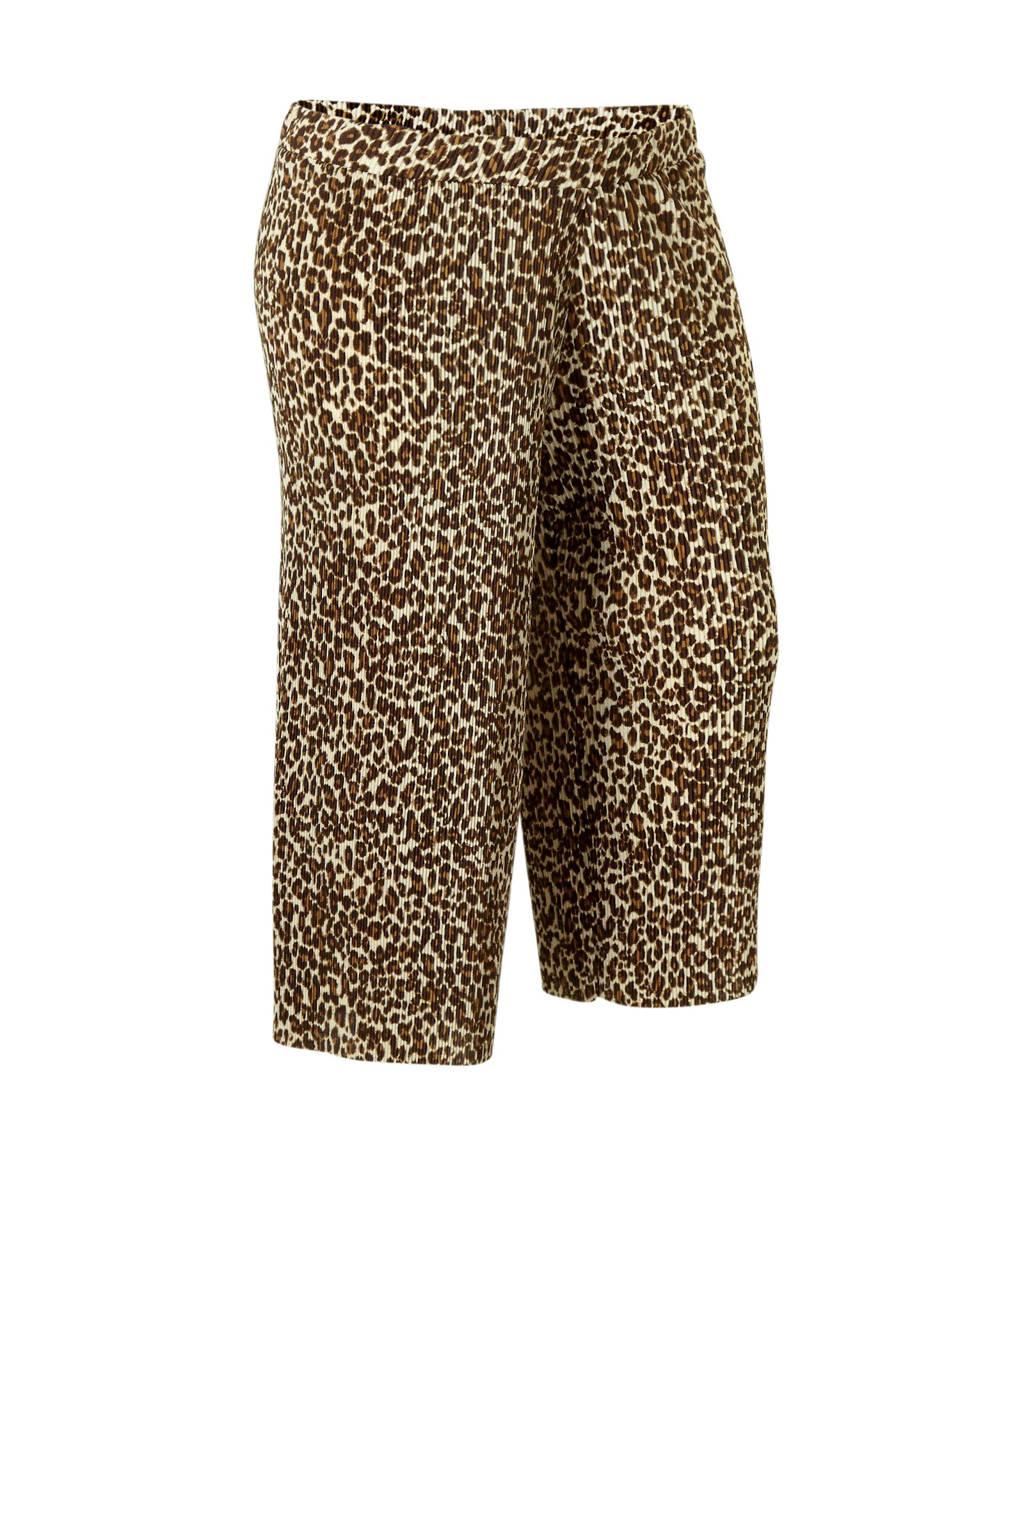 C&A XL Clockhouse culottes met plissé en tijgerprint beige, Beige/ Bruin/ Zwart